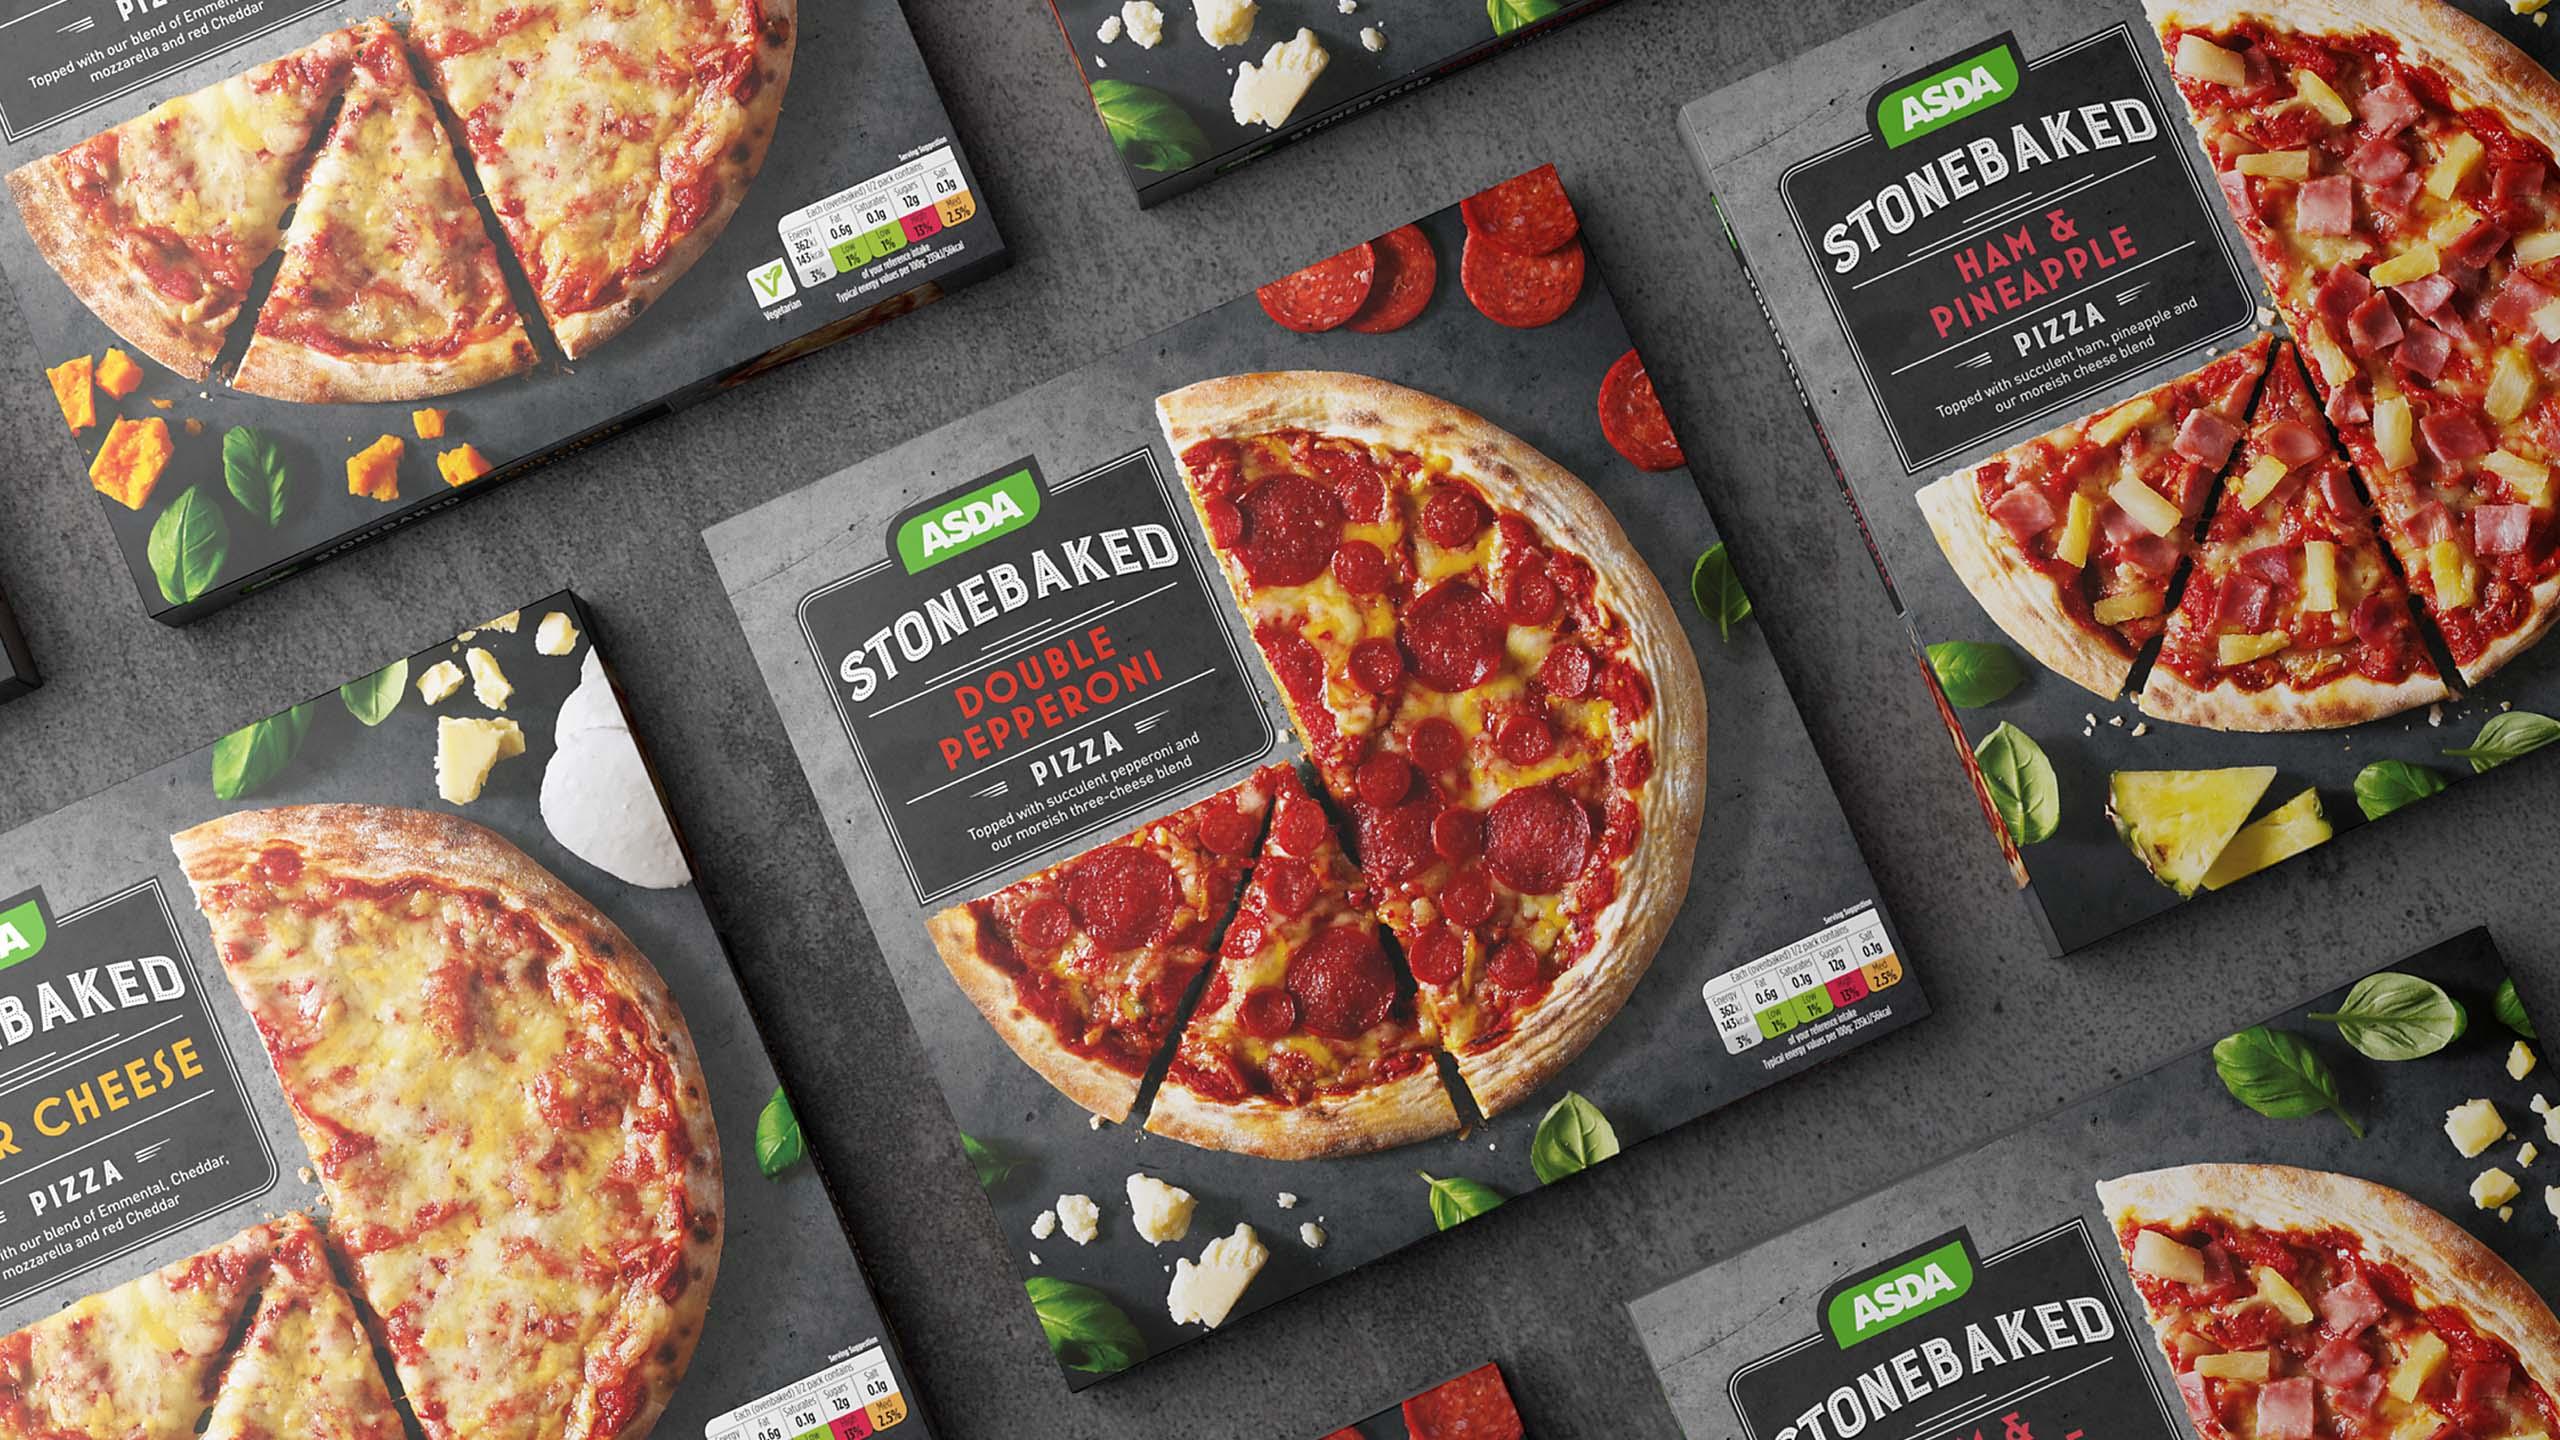 Range of ASDA frozen pizza packaging